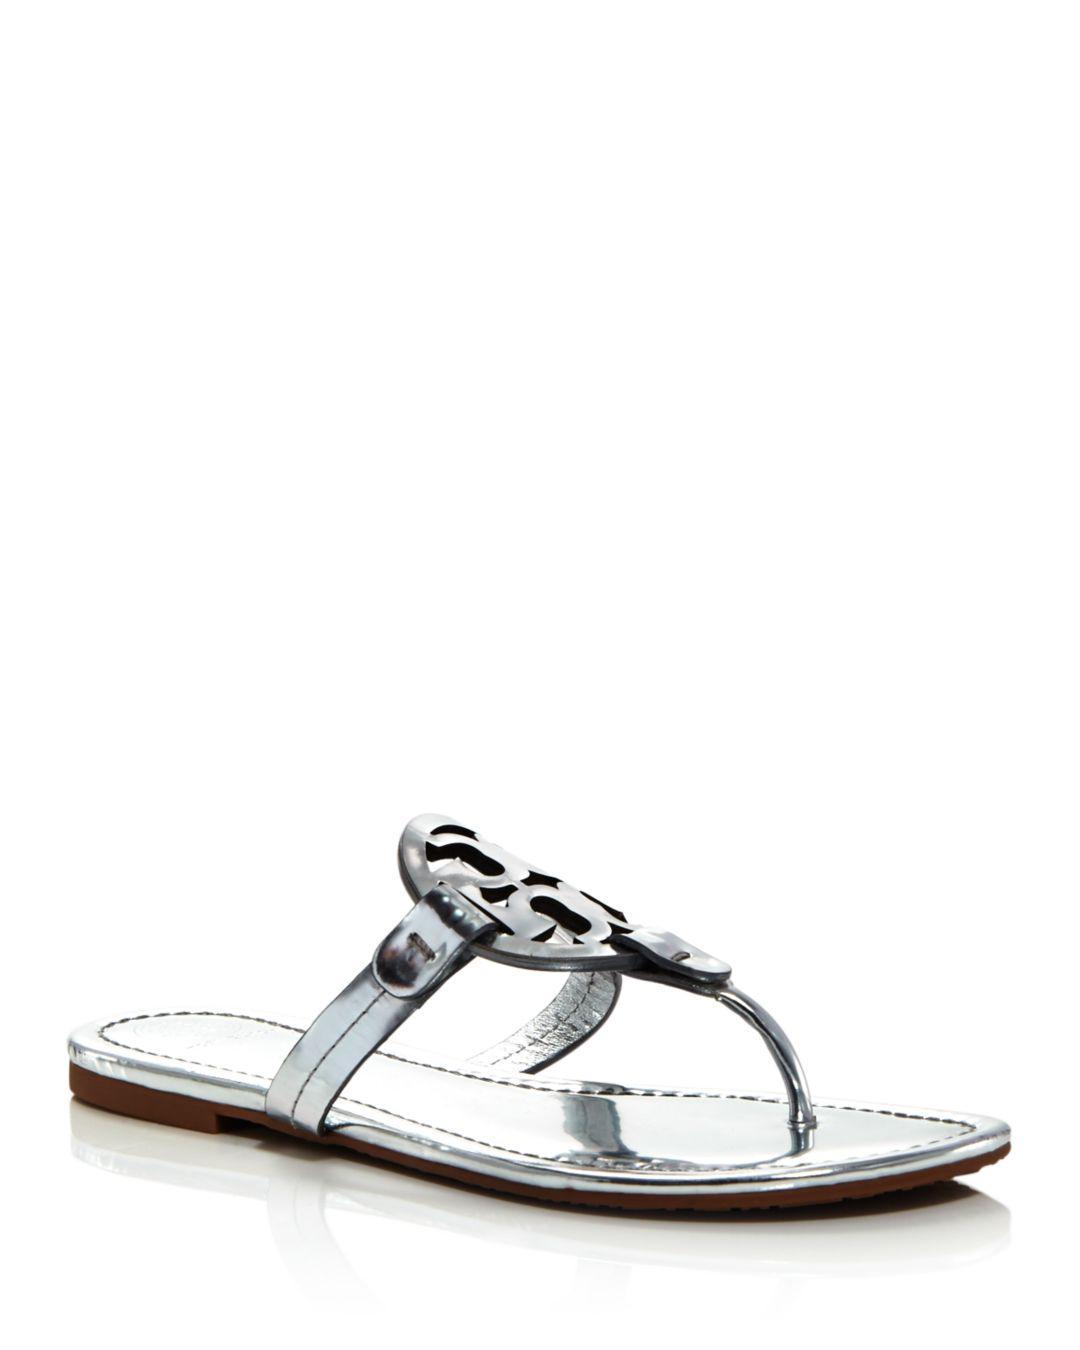 54f2863563904 Tory Burch - Metallic Women s Miller Leather Thong Sandals - Lyst. View  fullscreen